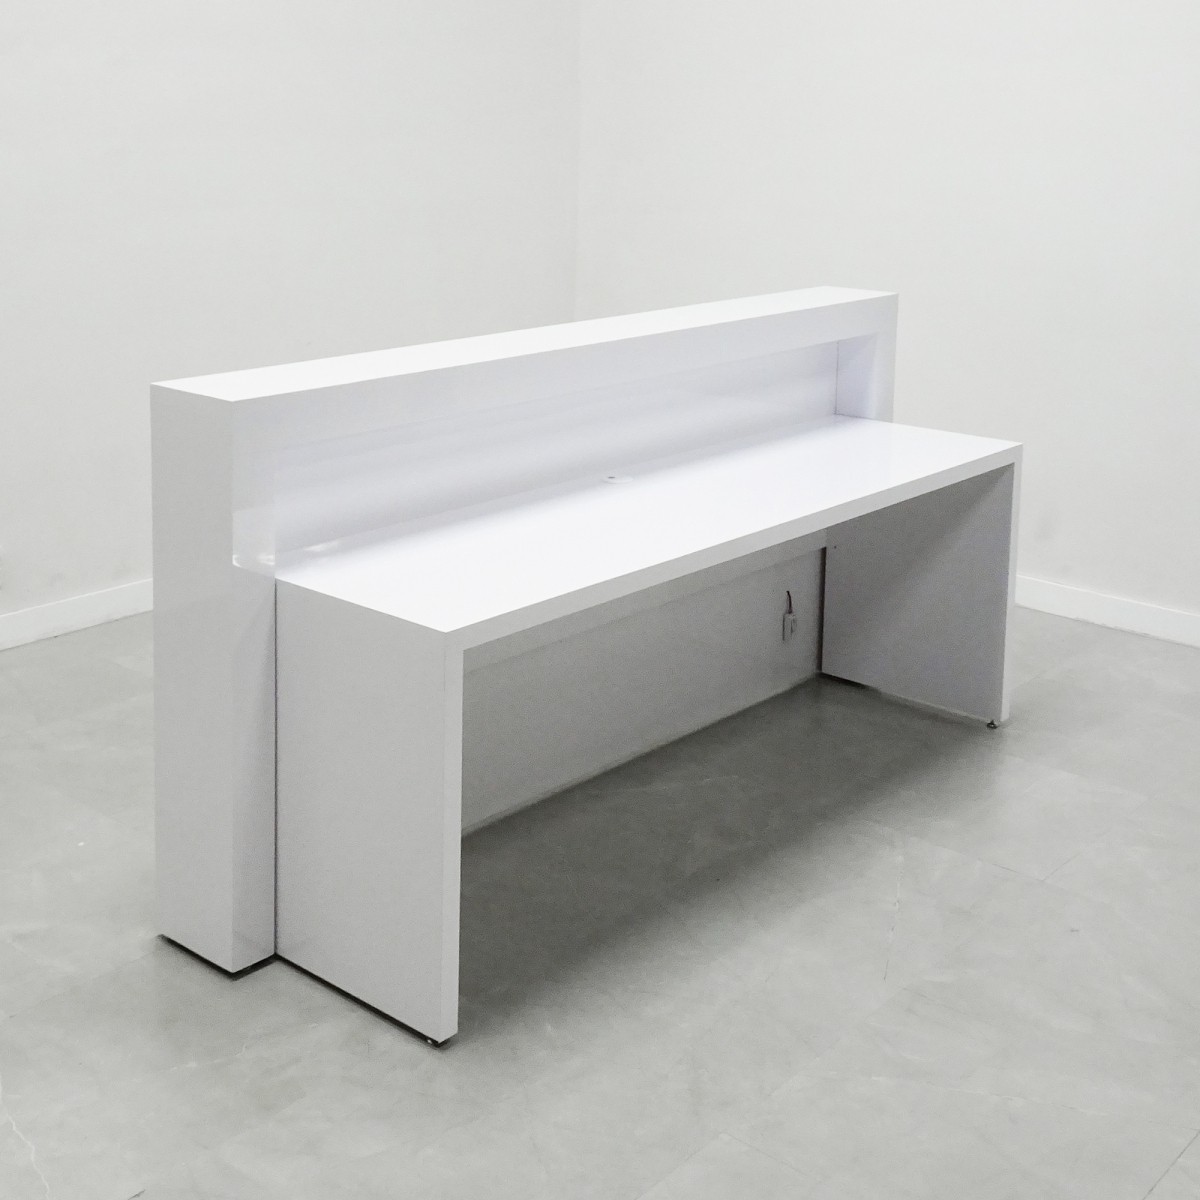 92 In. New York Reception Desk in White Glass Laminate